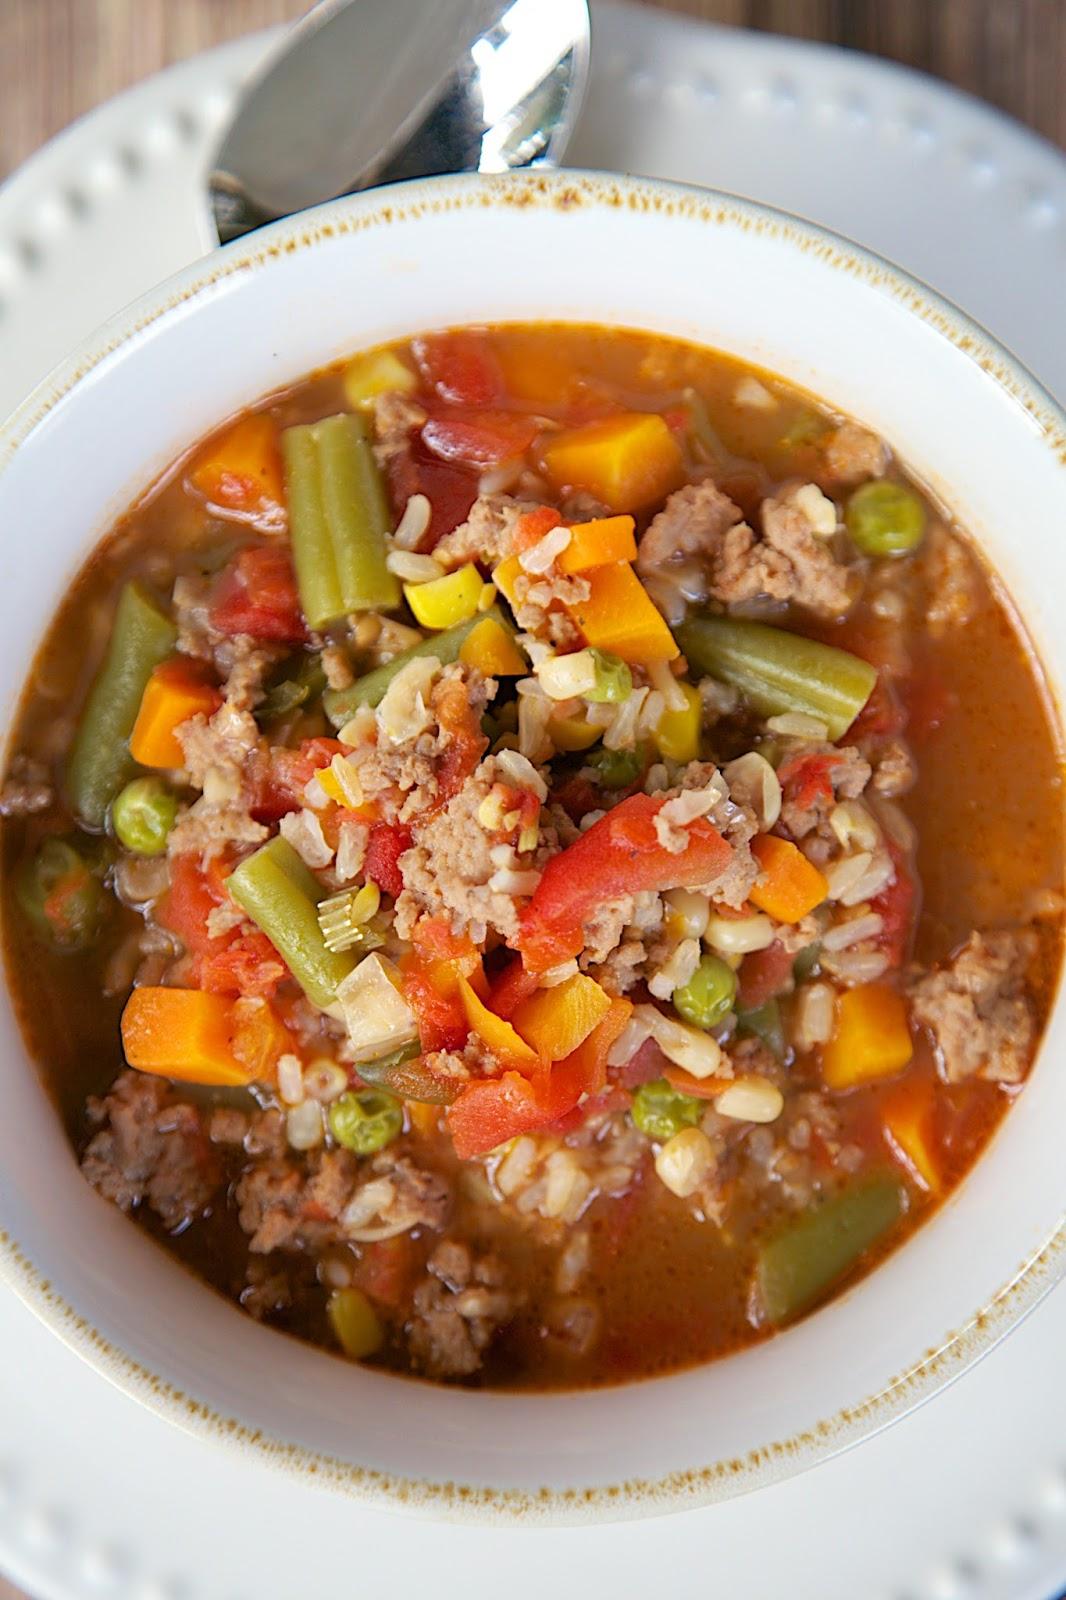 Turkey Vegetable Soup | 15 Healthy Ground Turkey Recipes | Homemade Recipes